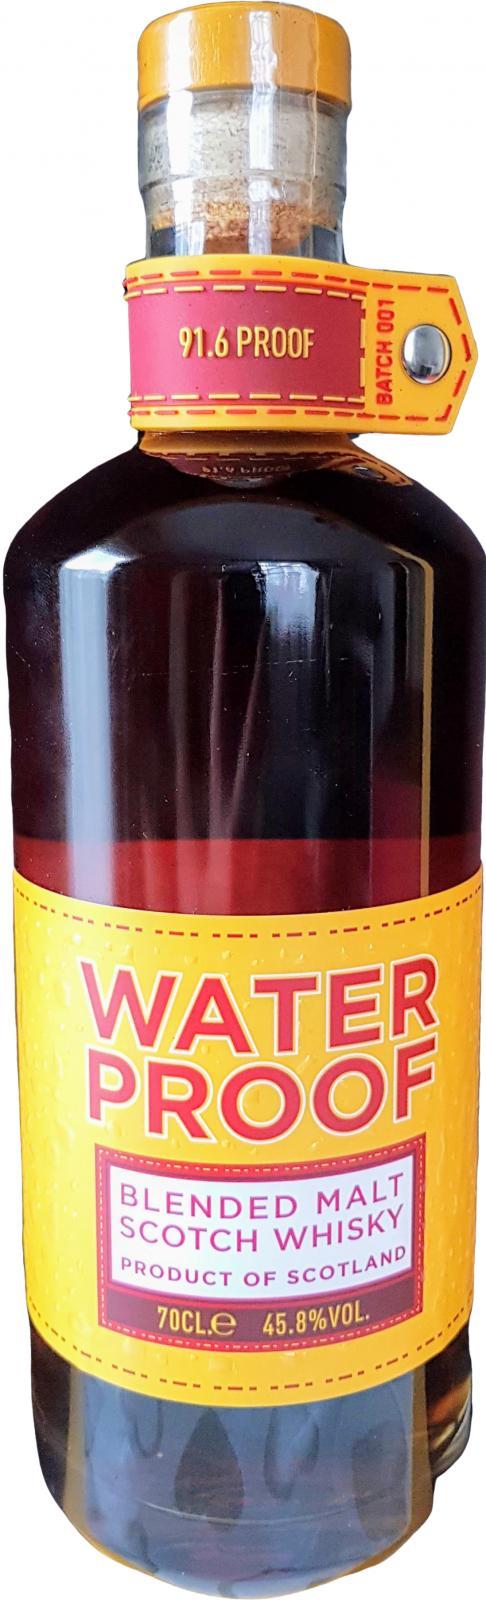 Waterproof Blended Malt Scotch Whisky